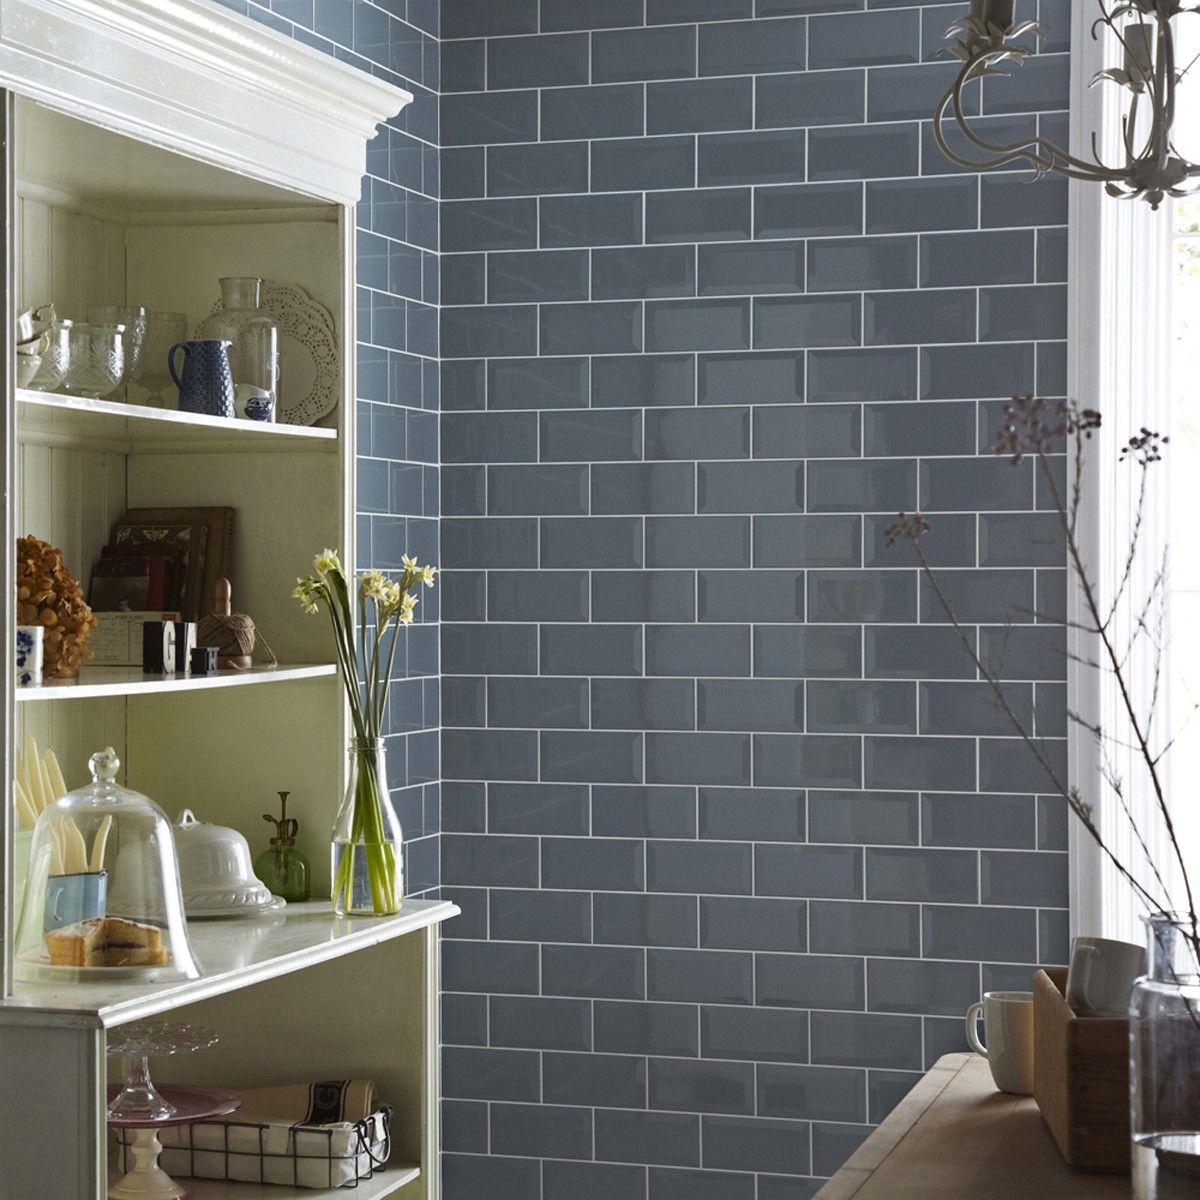 20x10 New Biselado Mineral Mist Kitchen Wall Tiles